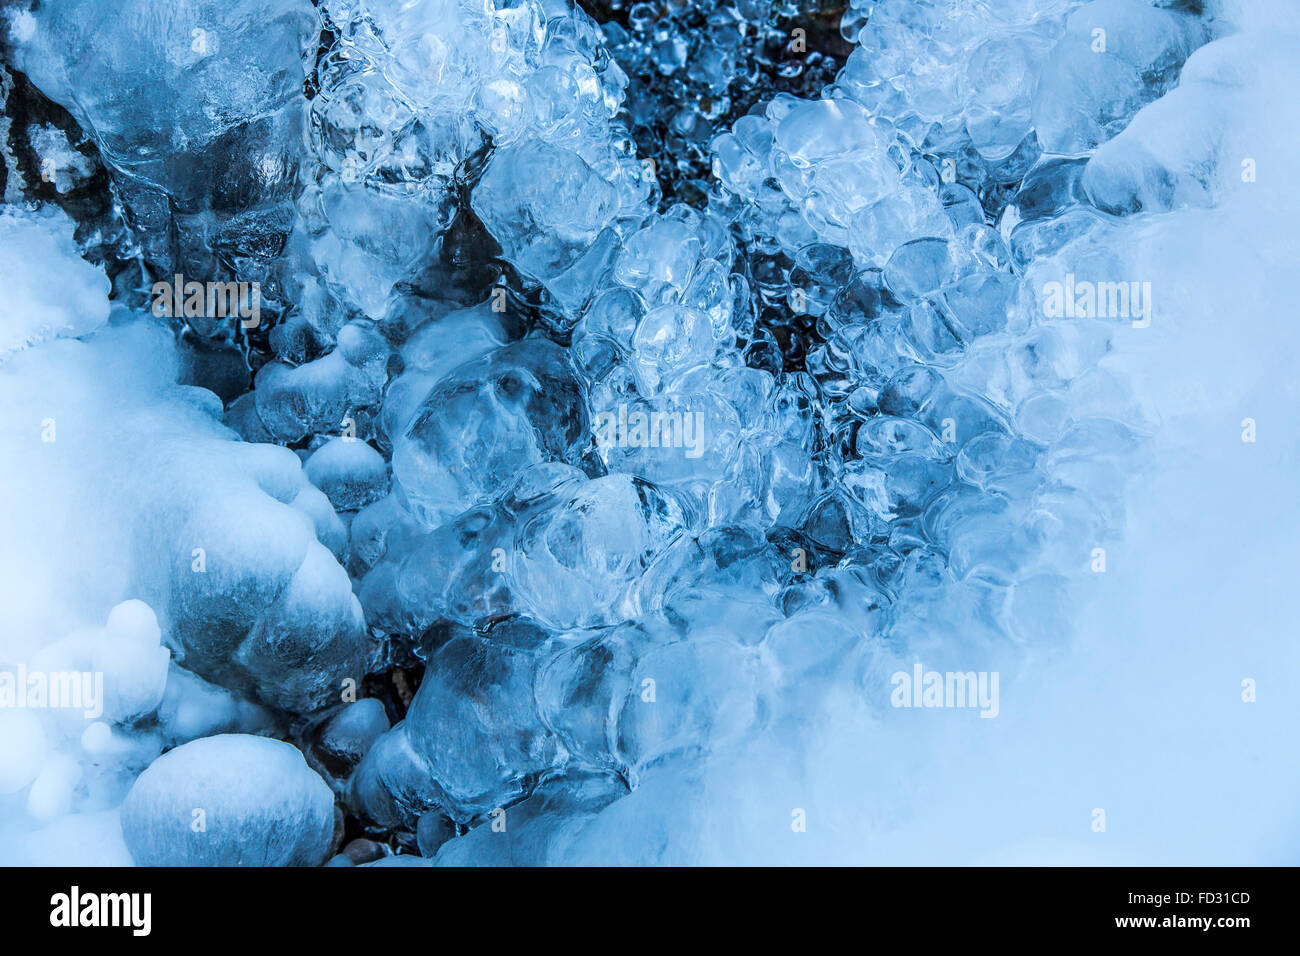 Frozen creek, frozen water, drops, ice in a stream, winter, Sauerland area, Germany Stock Photo